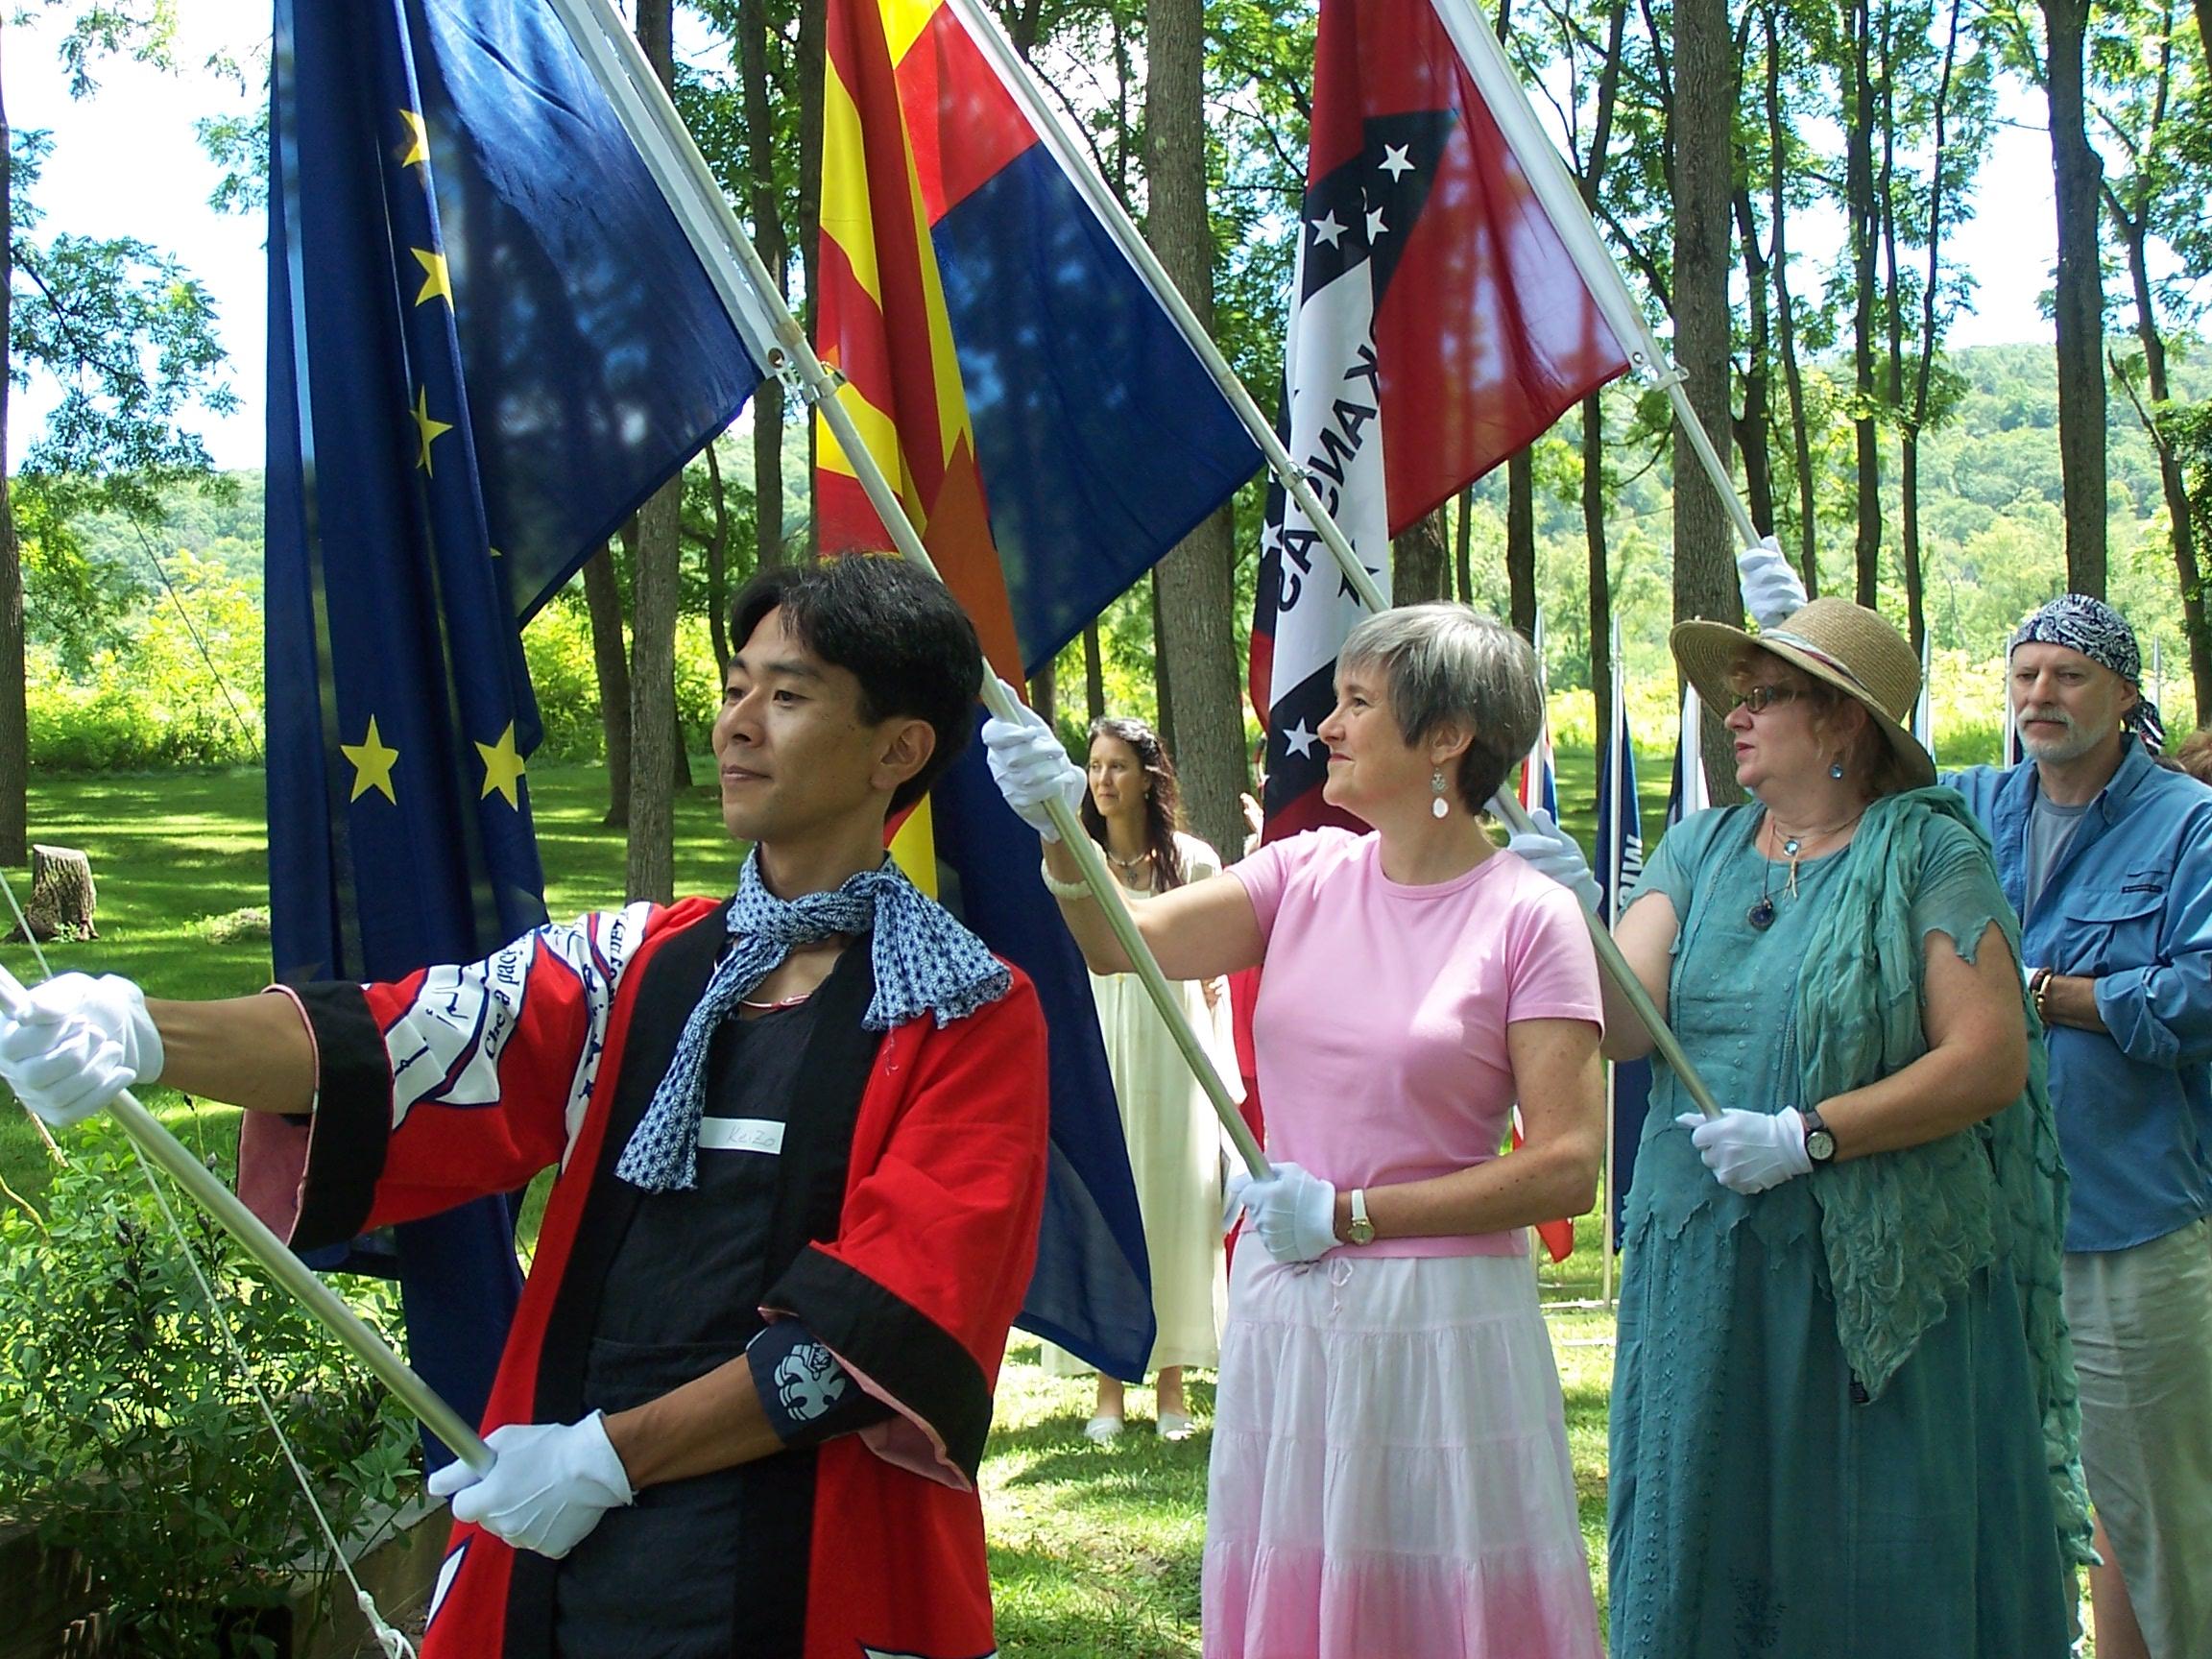 Keizo Aoi, Deborah Moldow and Tonia Shoumatoff participate in the United States of America Flag Ceremony.